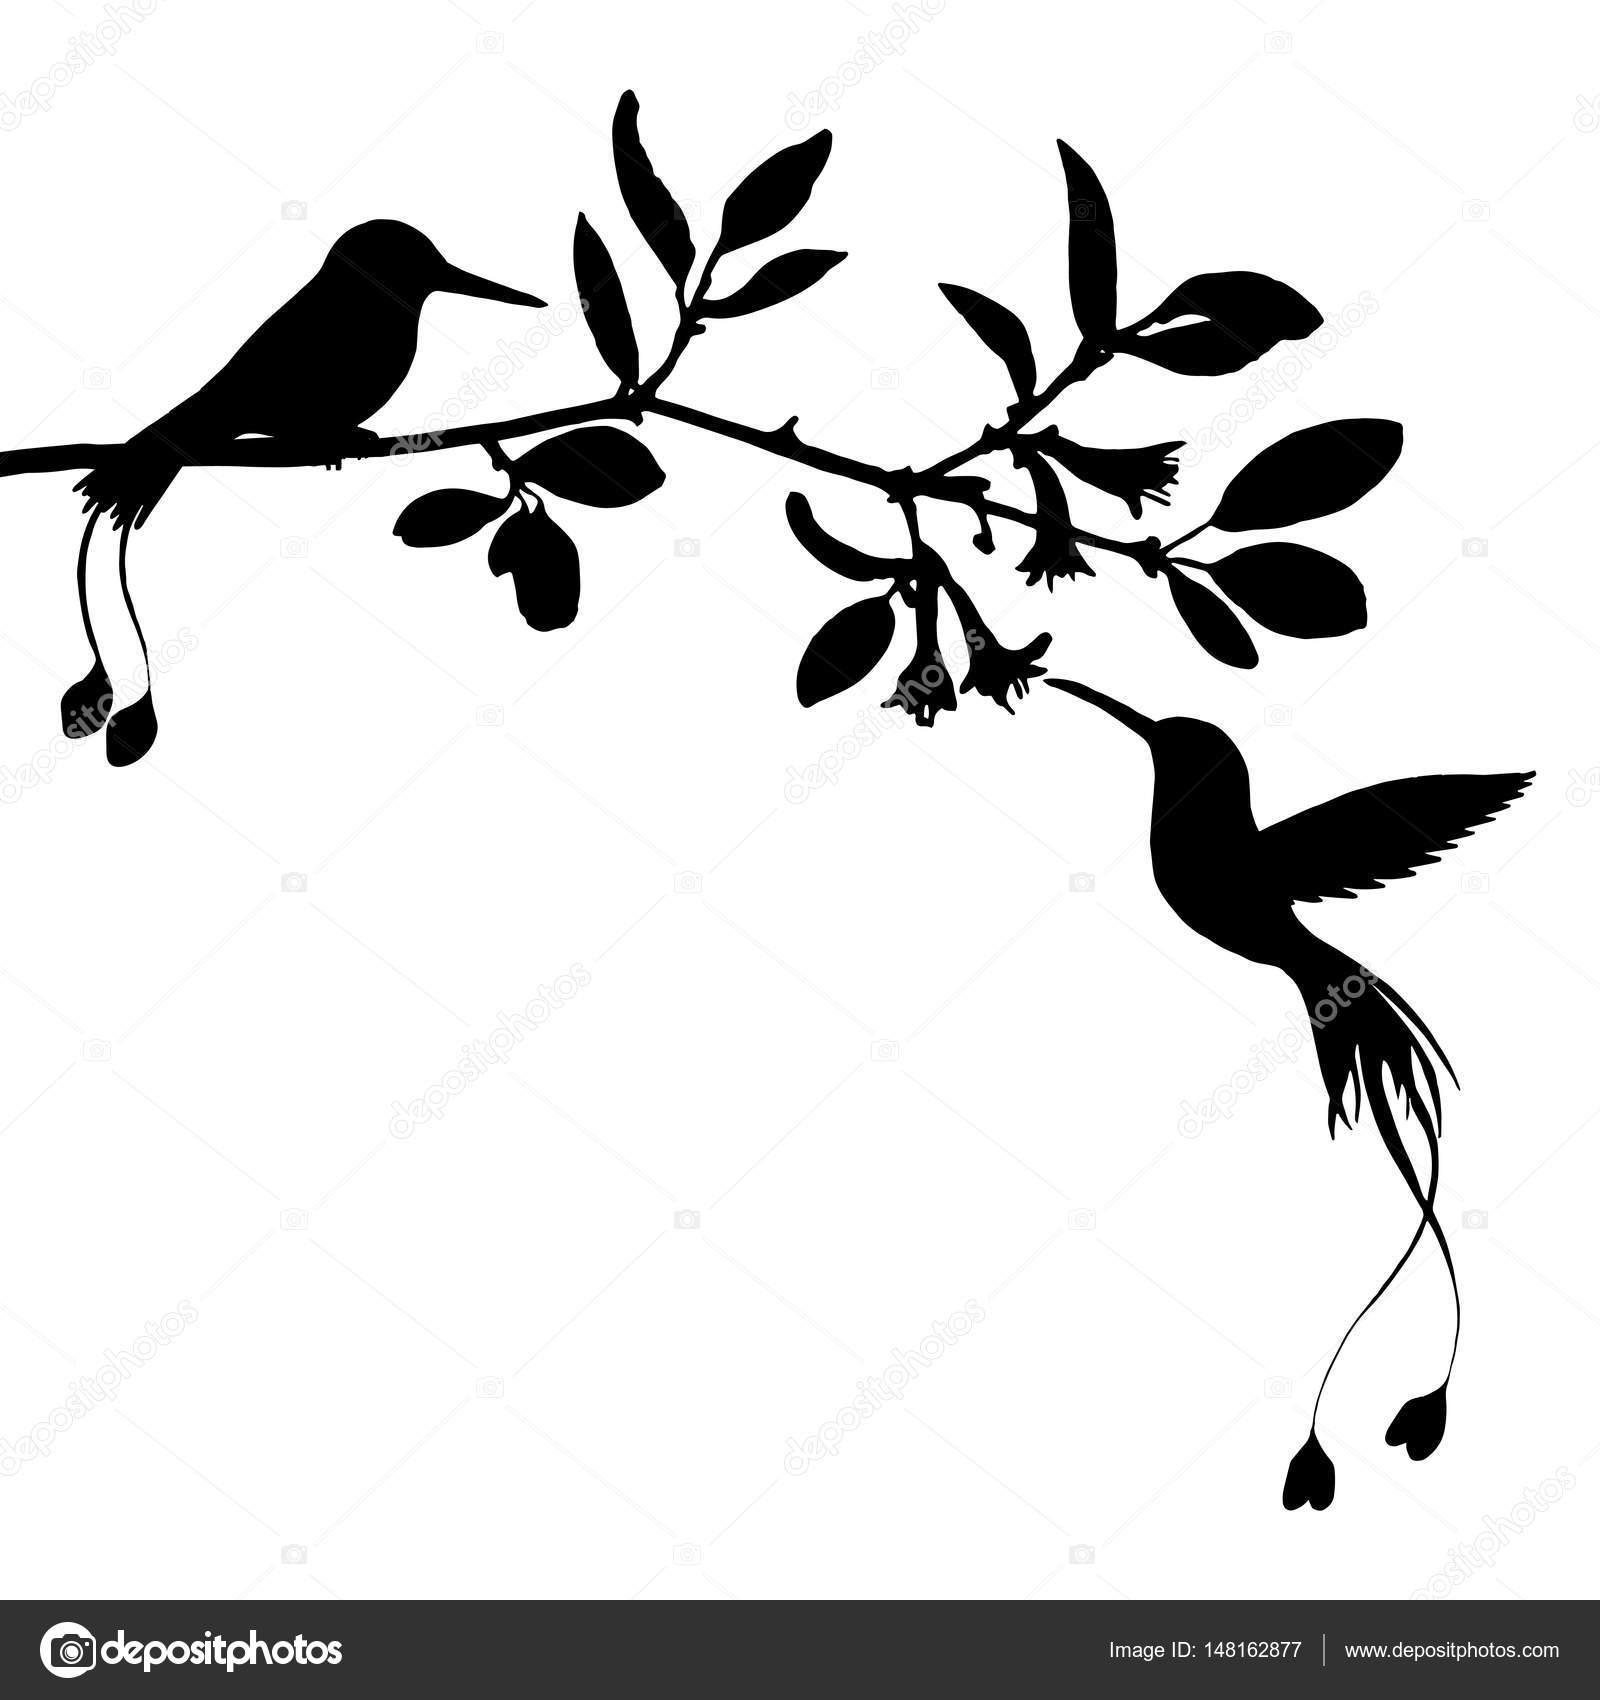 Depositphotos Stock Illustration Hummingbirds And Flowers Silhouettes Hummingbird Stencil